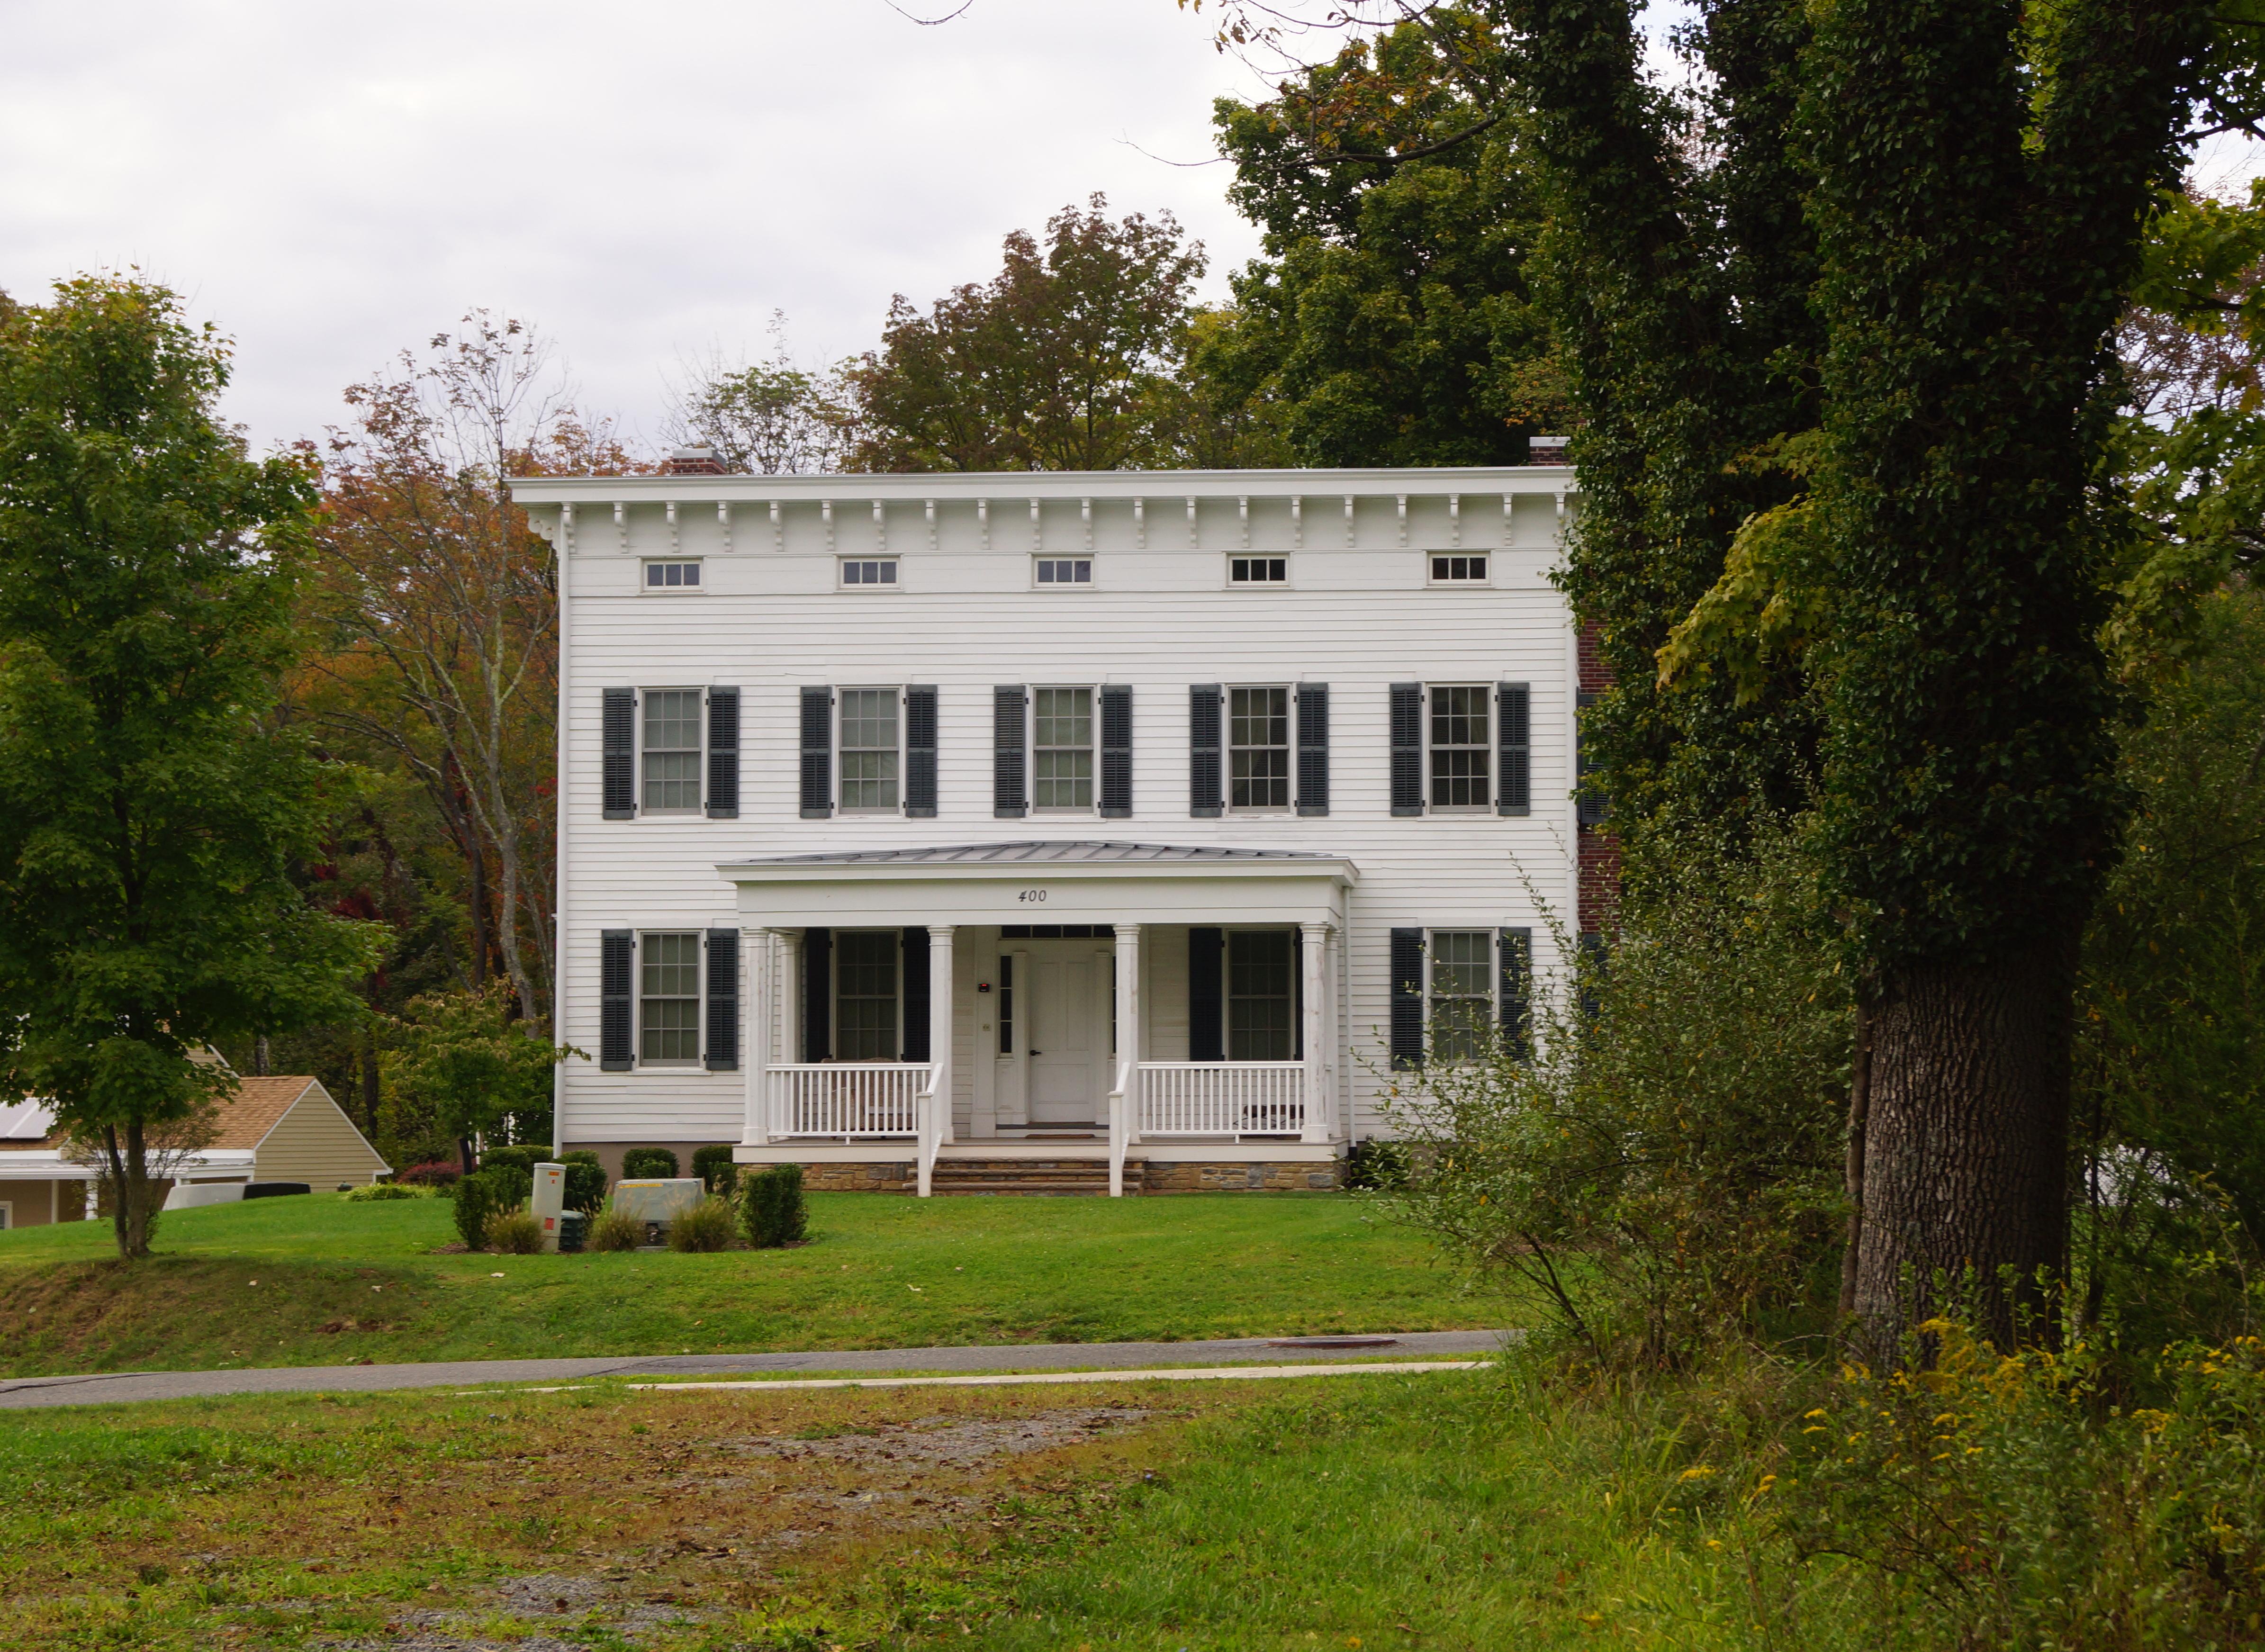 Tewksbury Township New Jersey